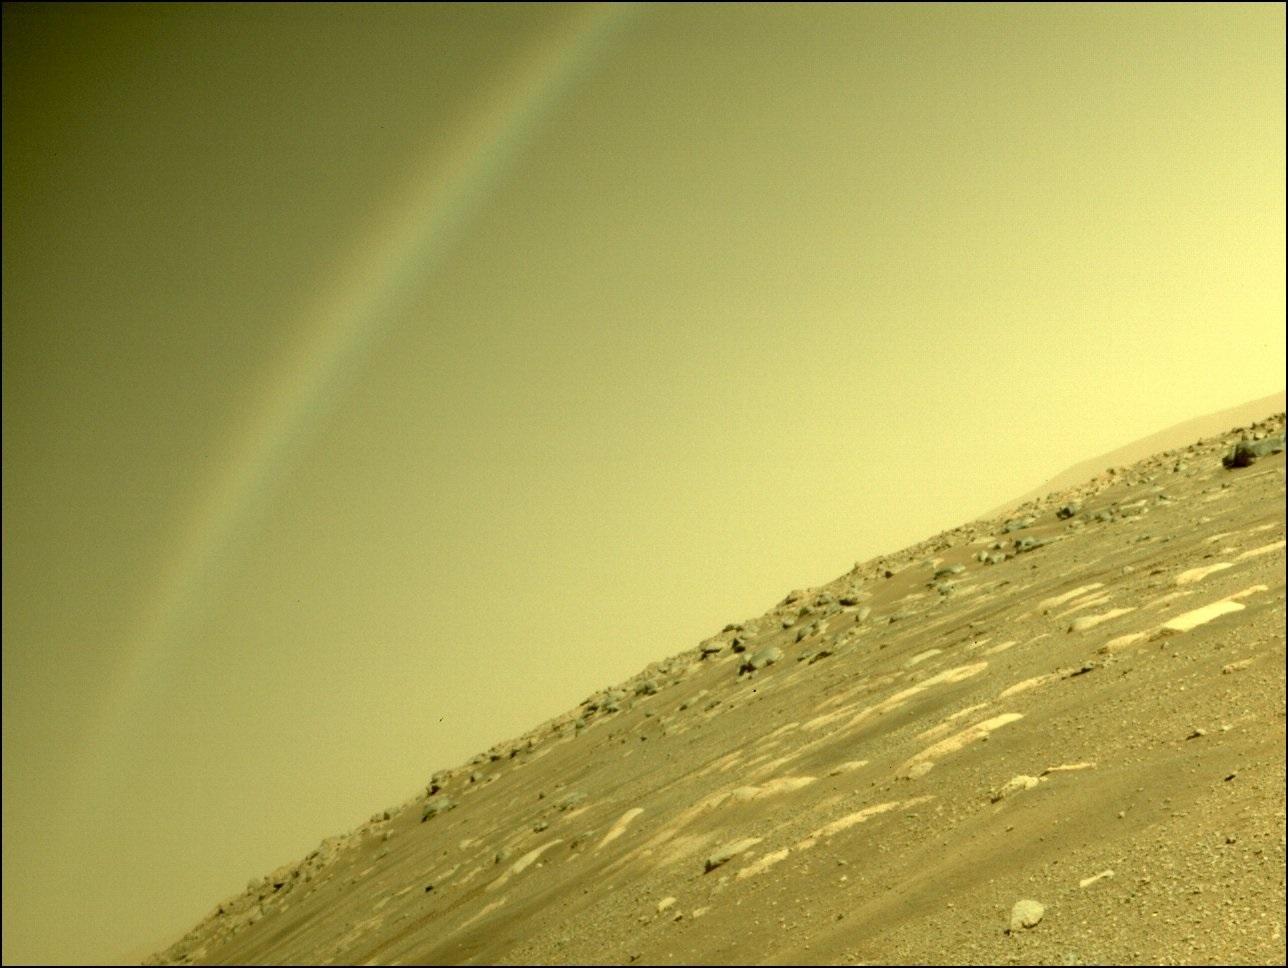 NASA澄清說,無人探測器「毅力號」在火星上拍到的弧形結構不是彩虹,而是鏡頭眩光。(NASA)